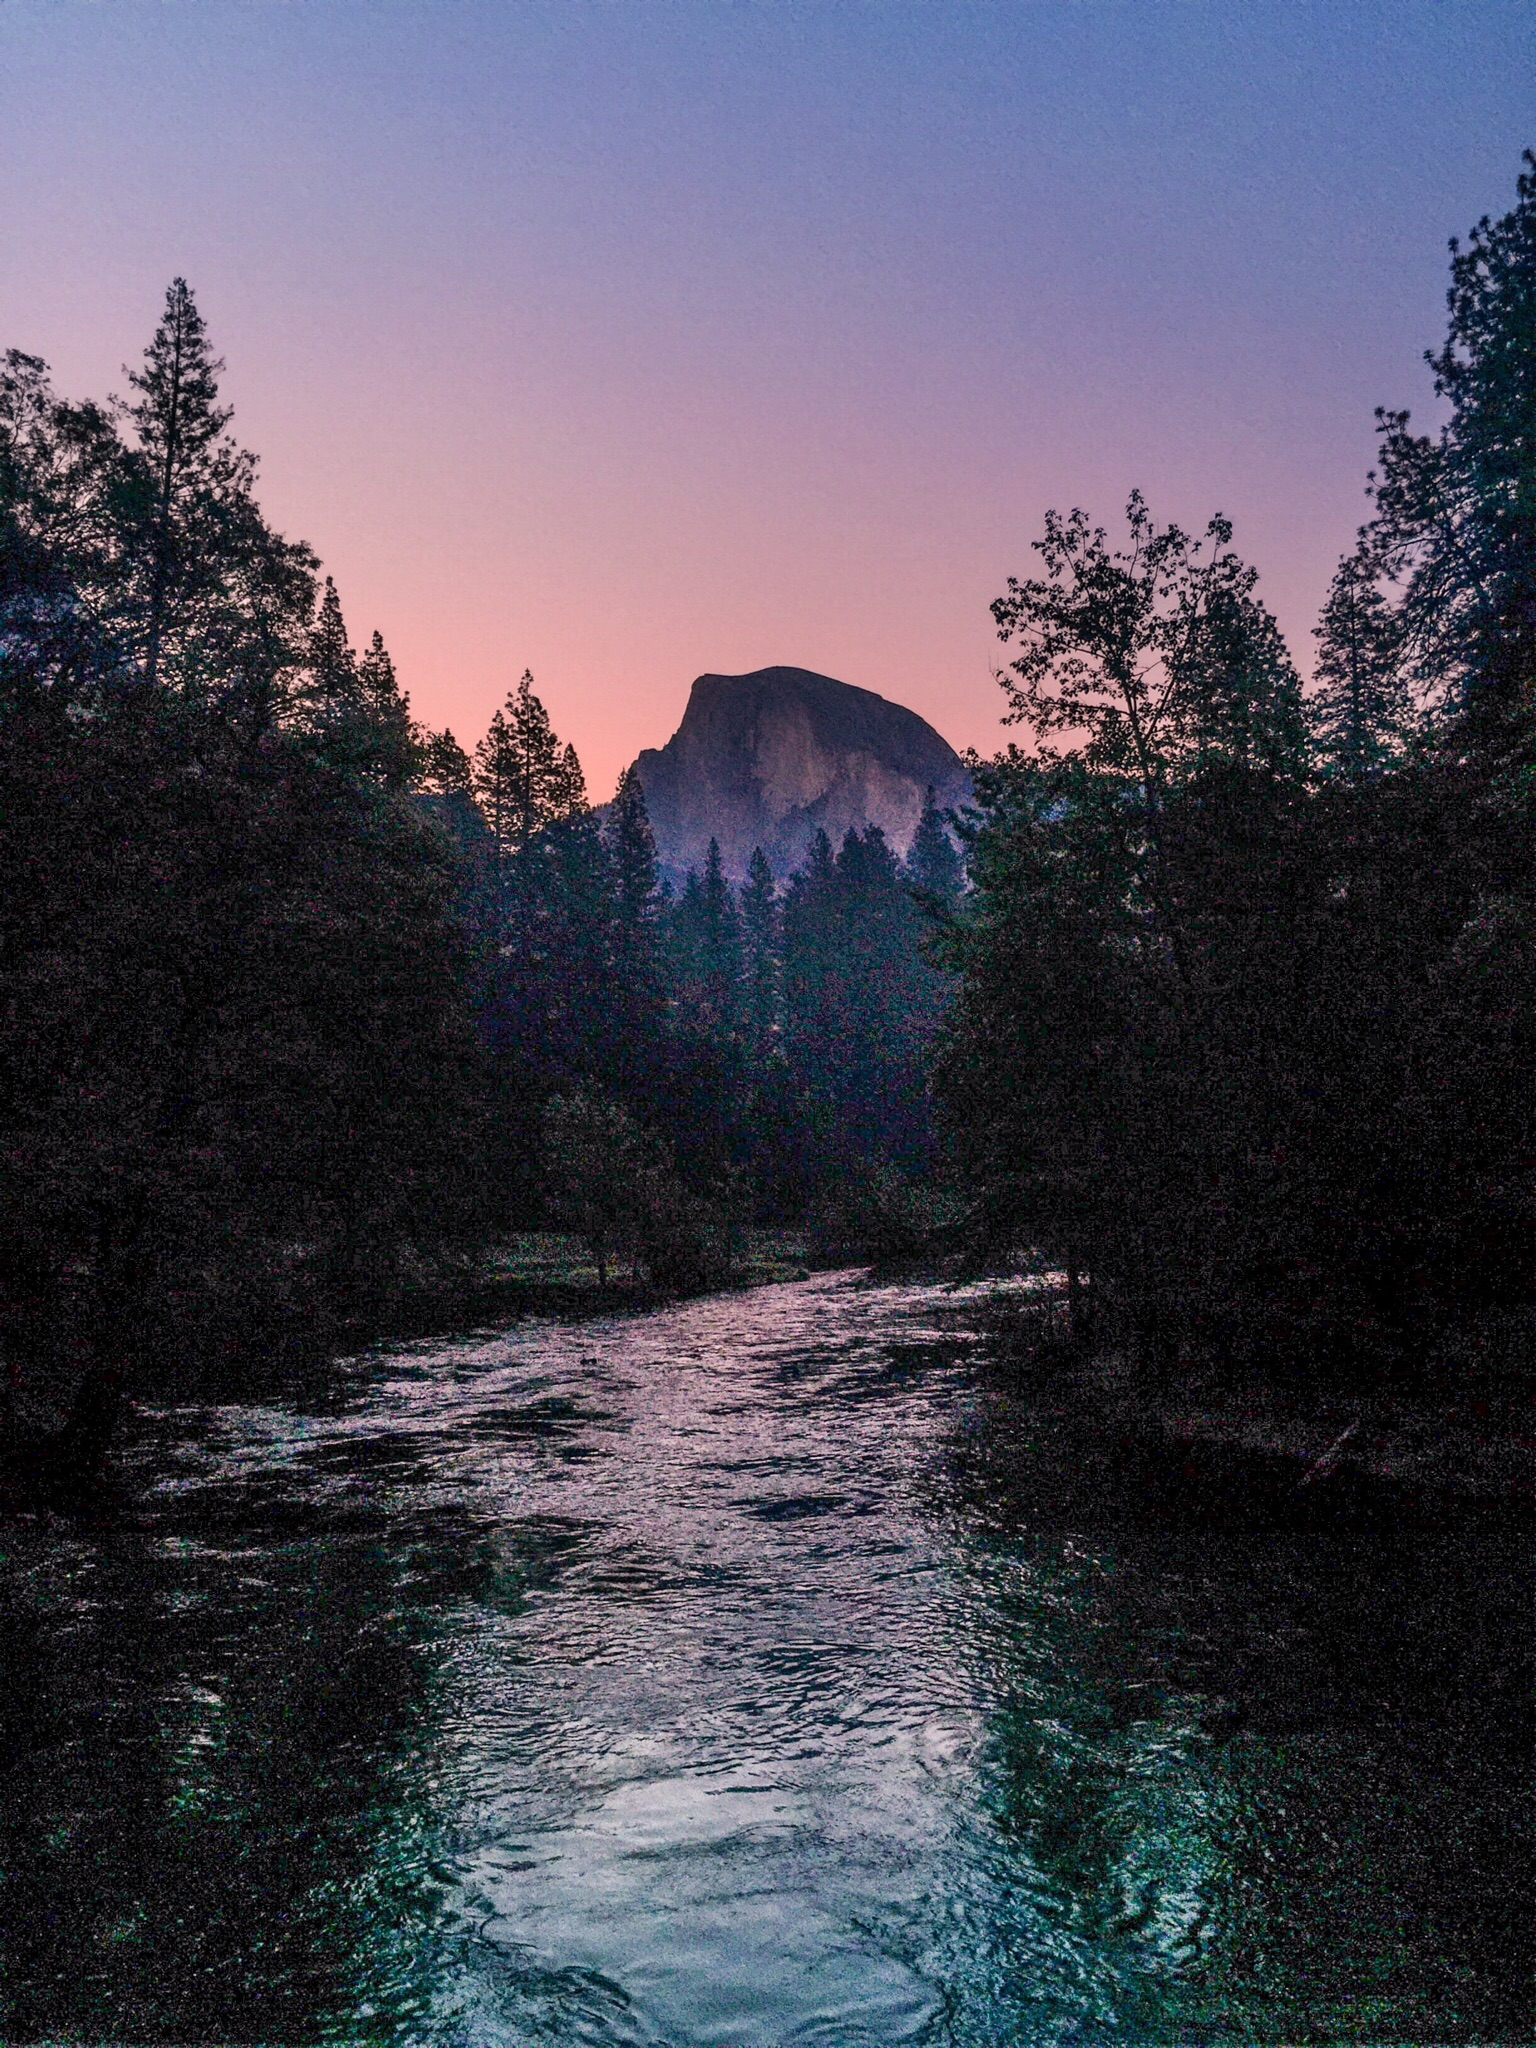 Yosemite - Half Dome at sunset